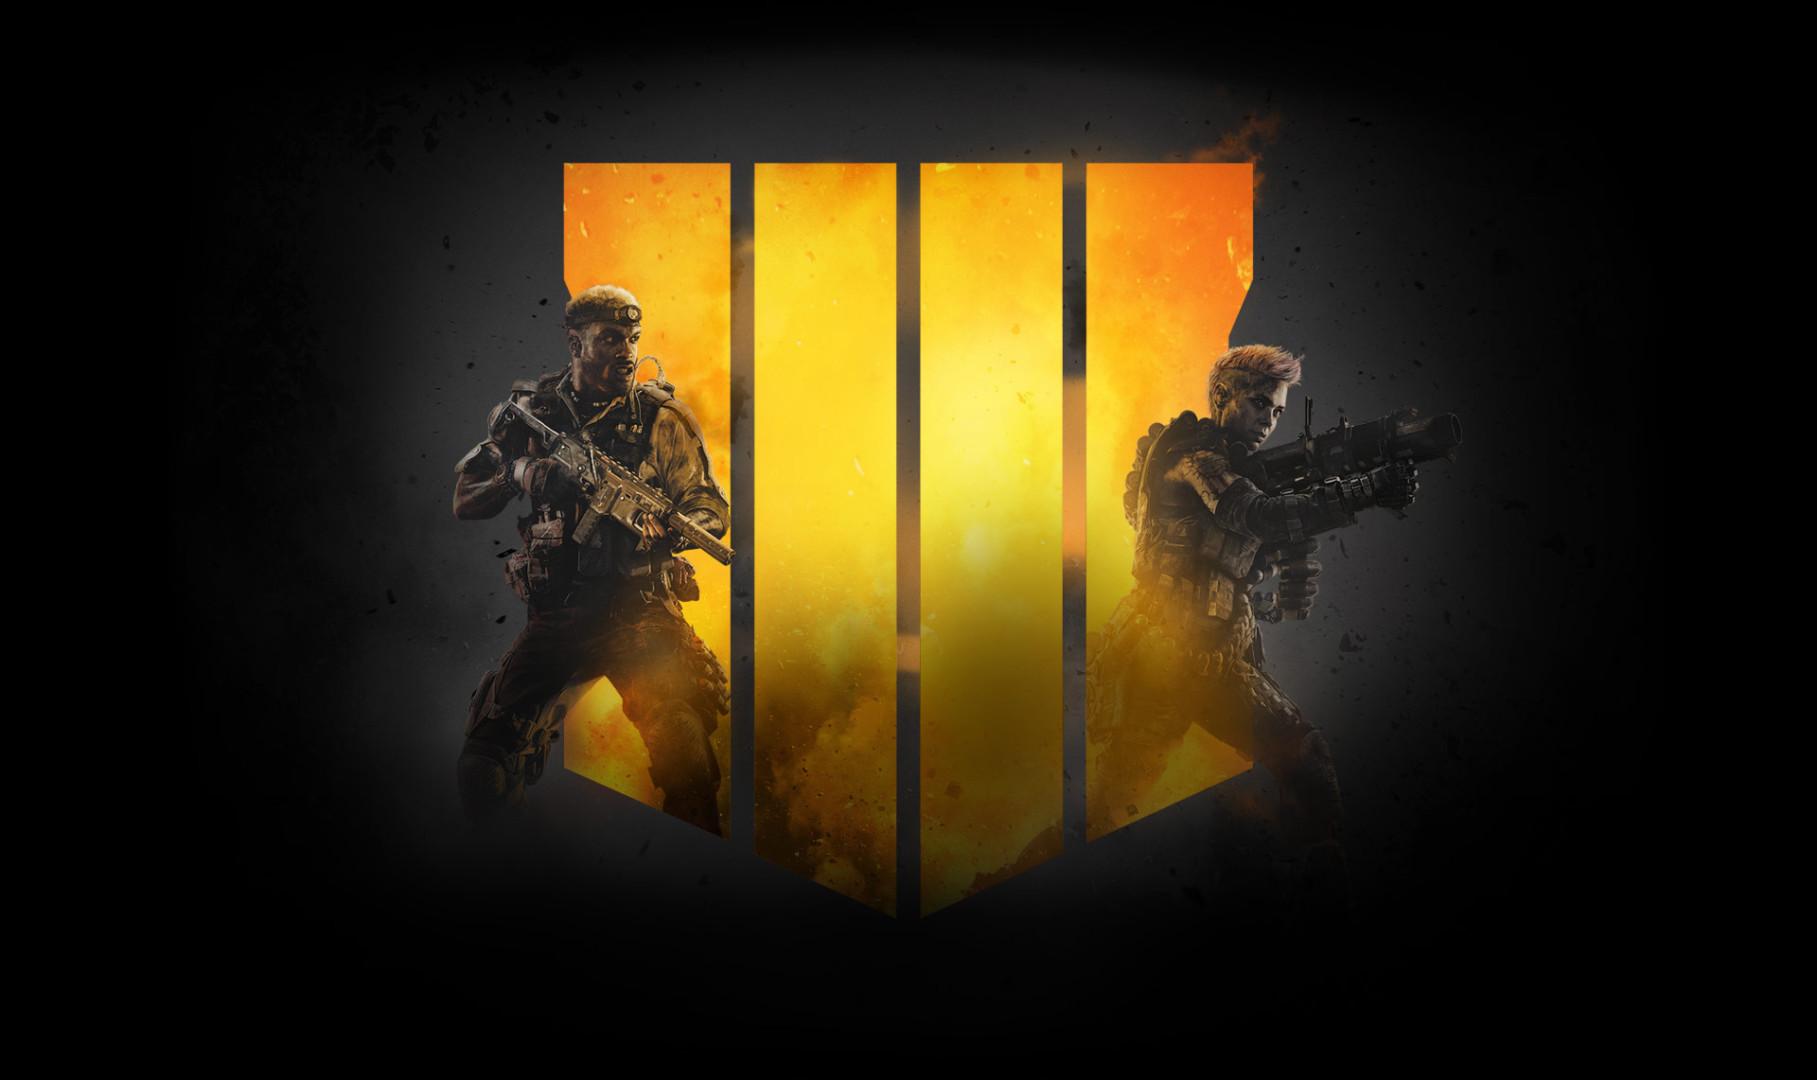 Call of Duty Black Ops 4 confirma Blackout, la esperada beta del modo battle royale